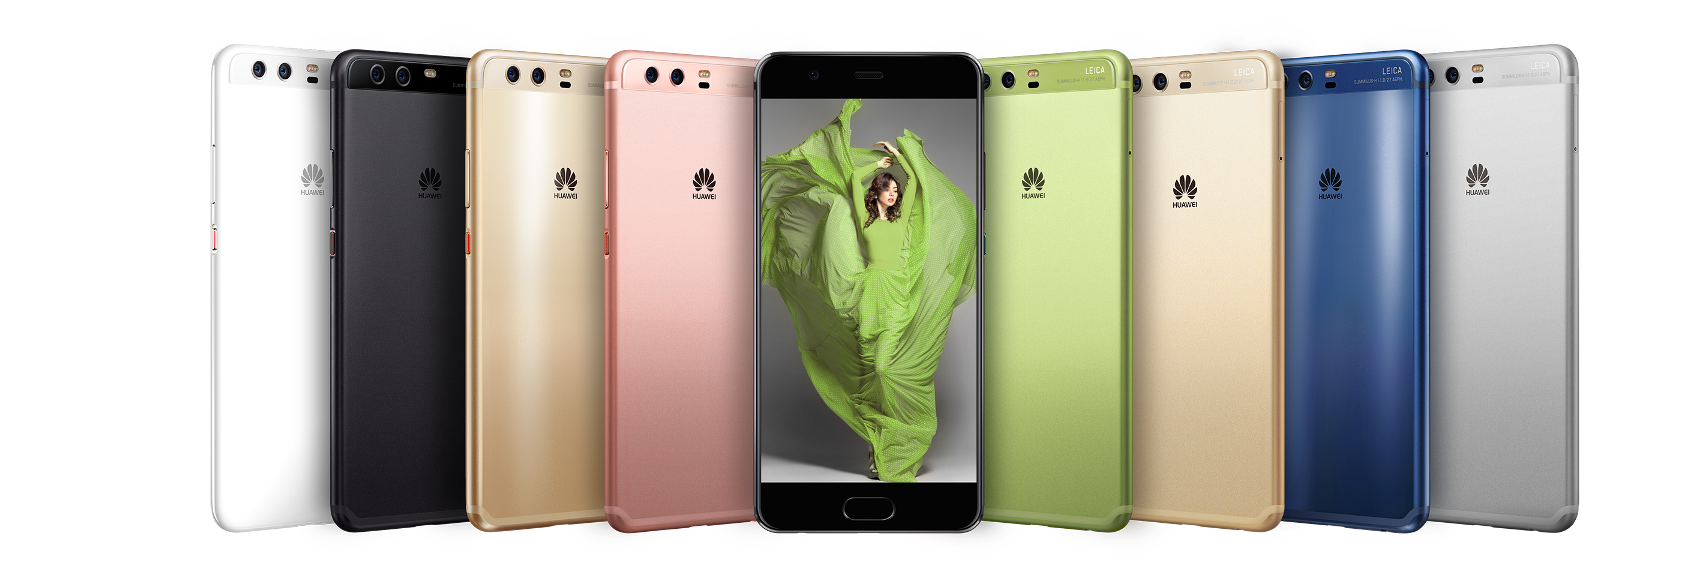 Huawei P11 anticipazioni: fotocamera senza precedenti